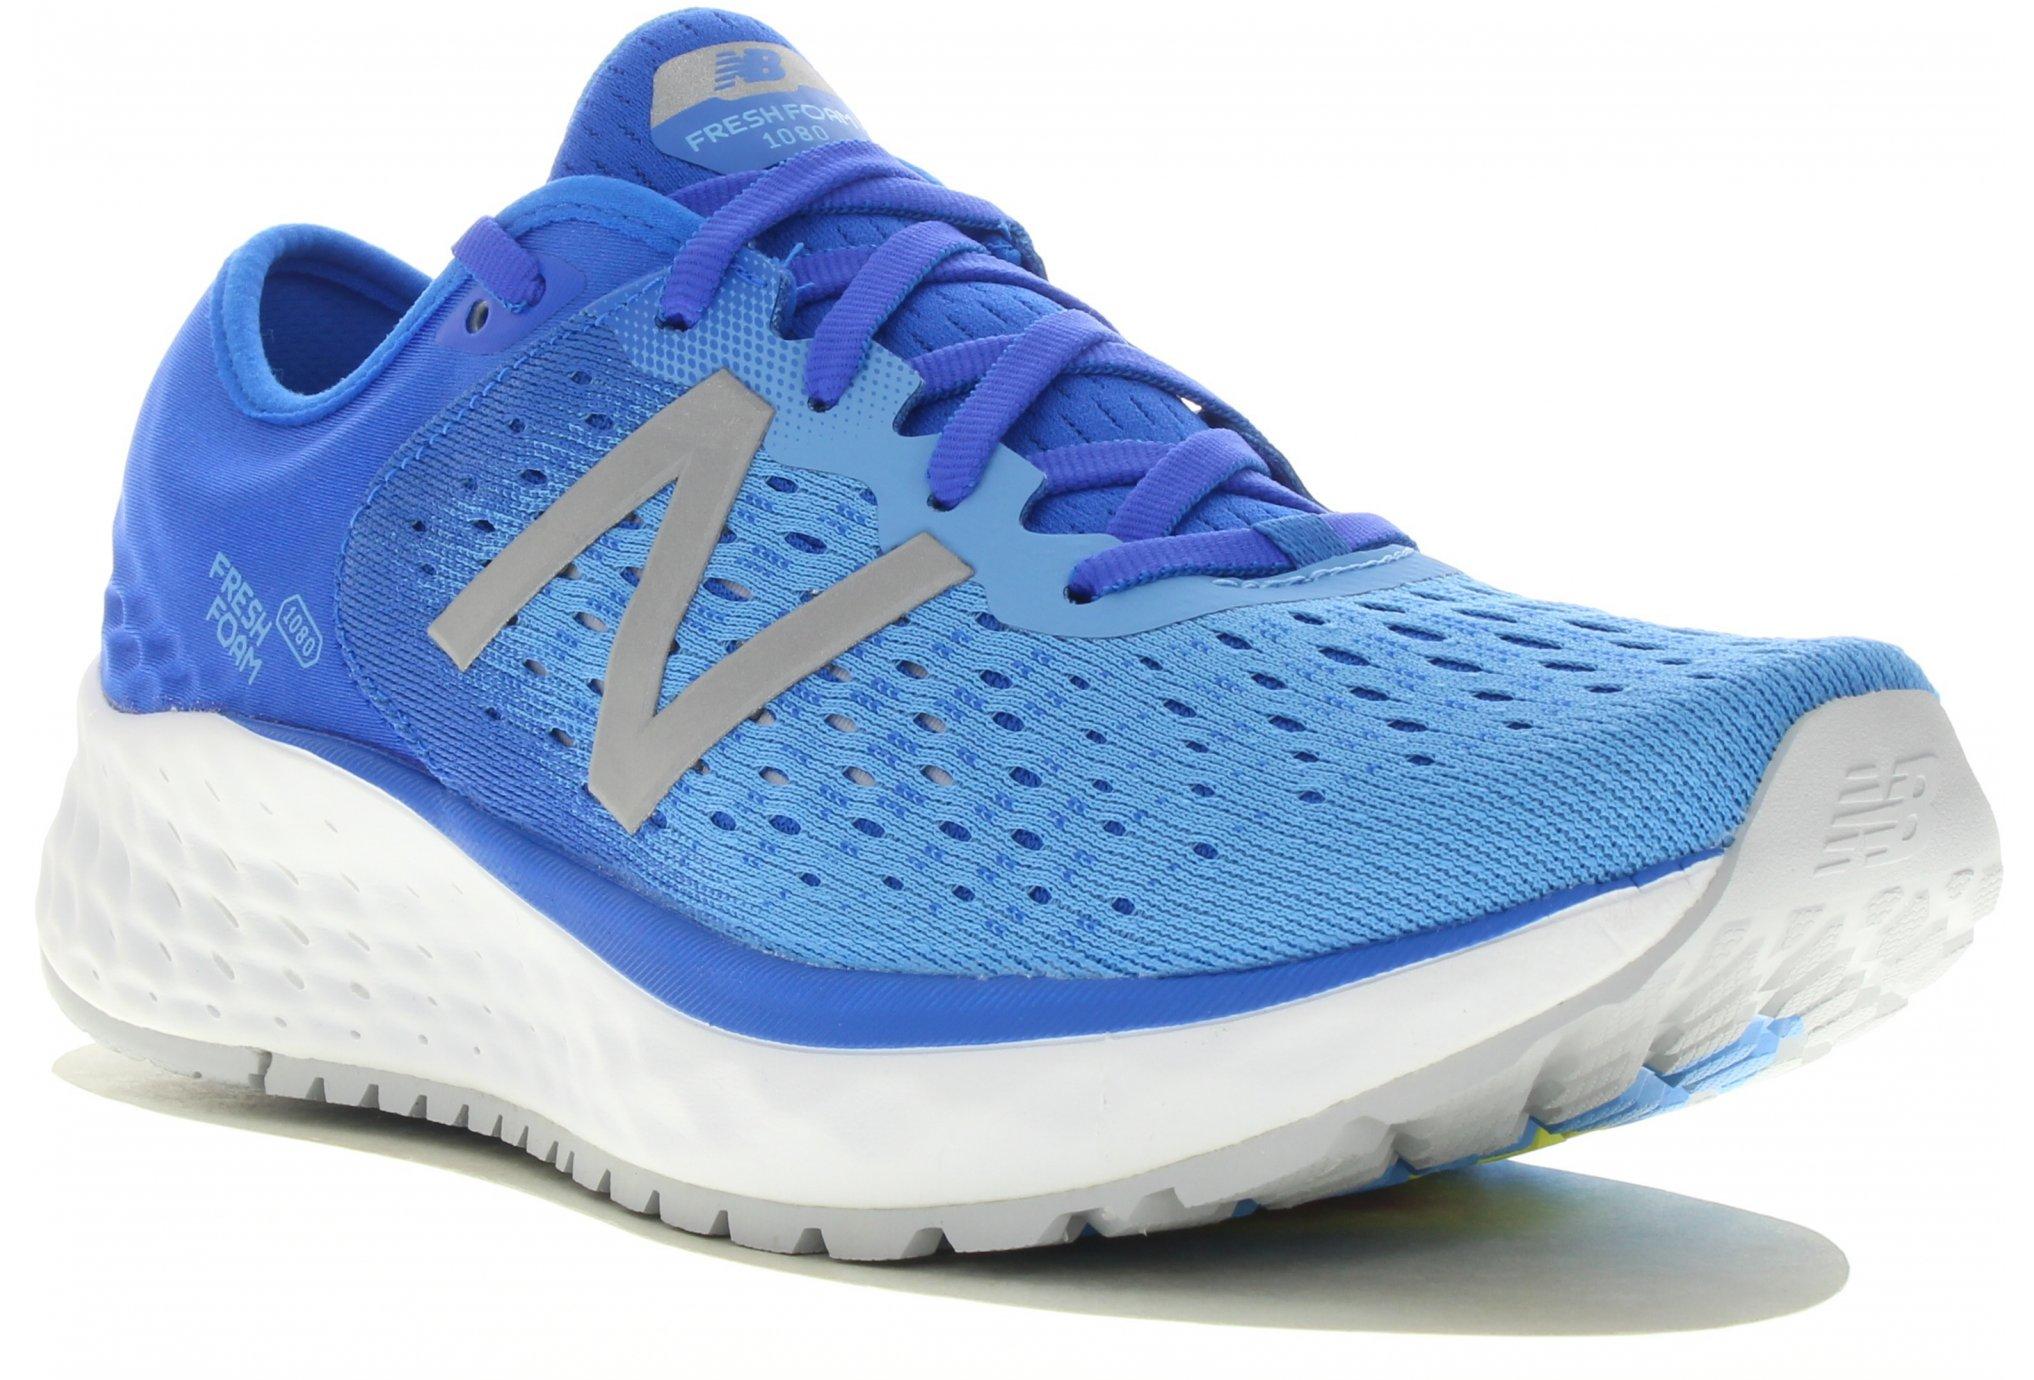 New Balance Fresh Foam W 1080 V9 - B Chaussures running femme